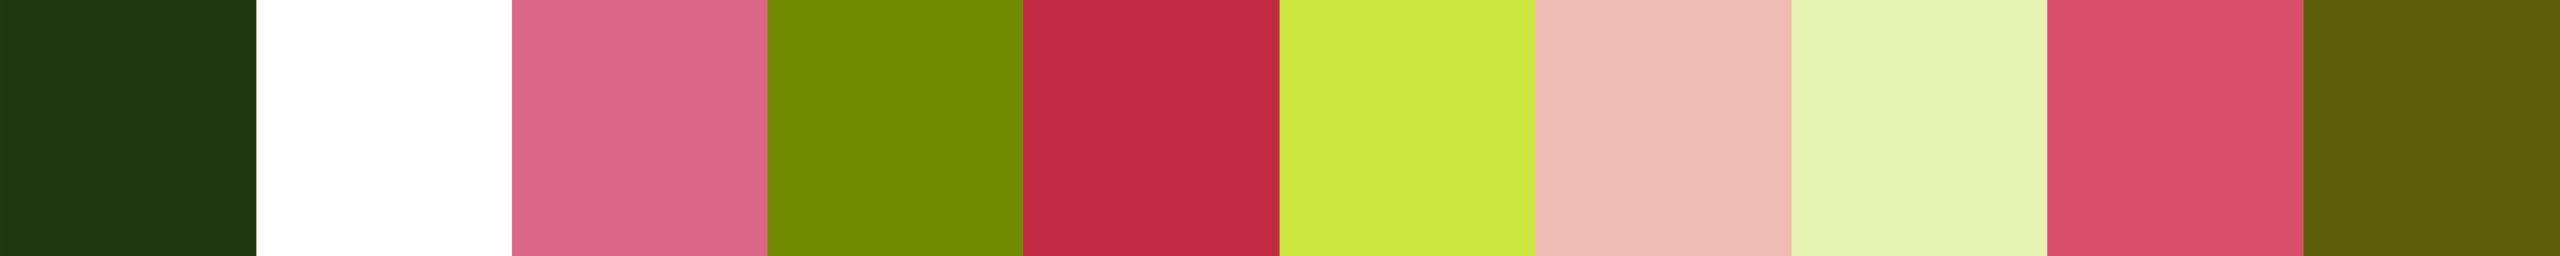 488 Kodeloca Color Palette